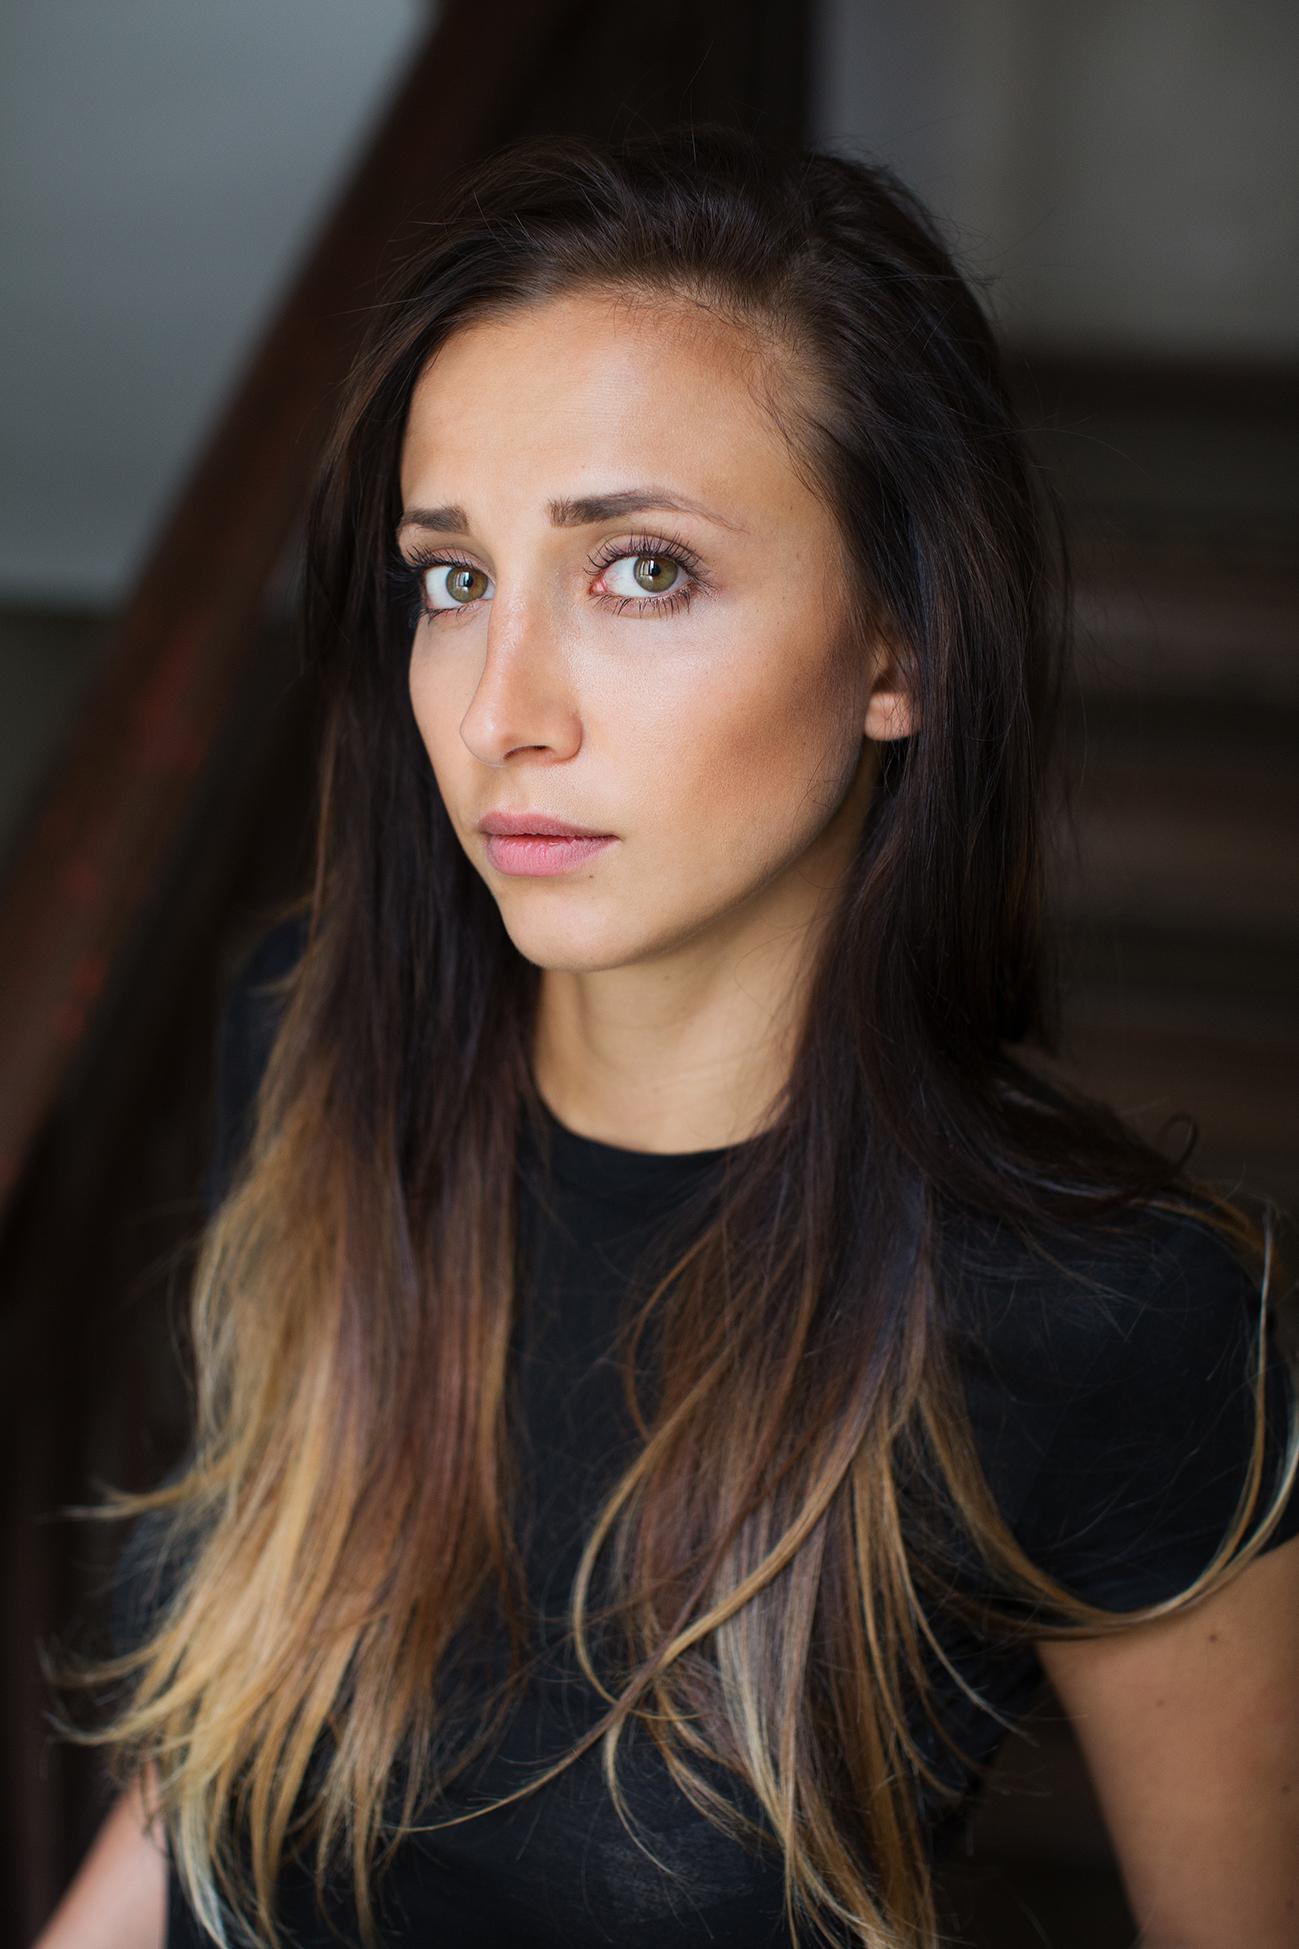 Nikoletta Podlecki